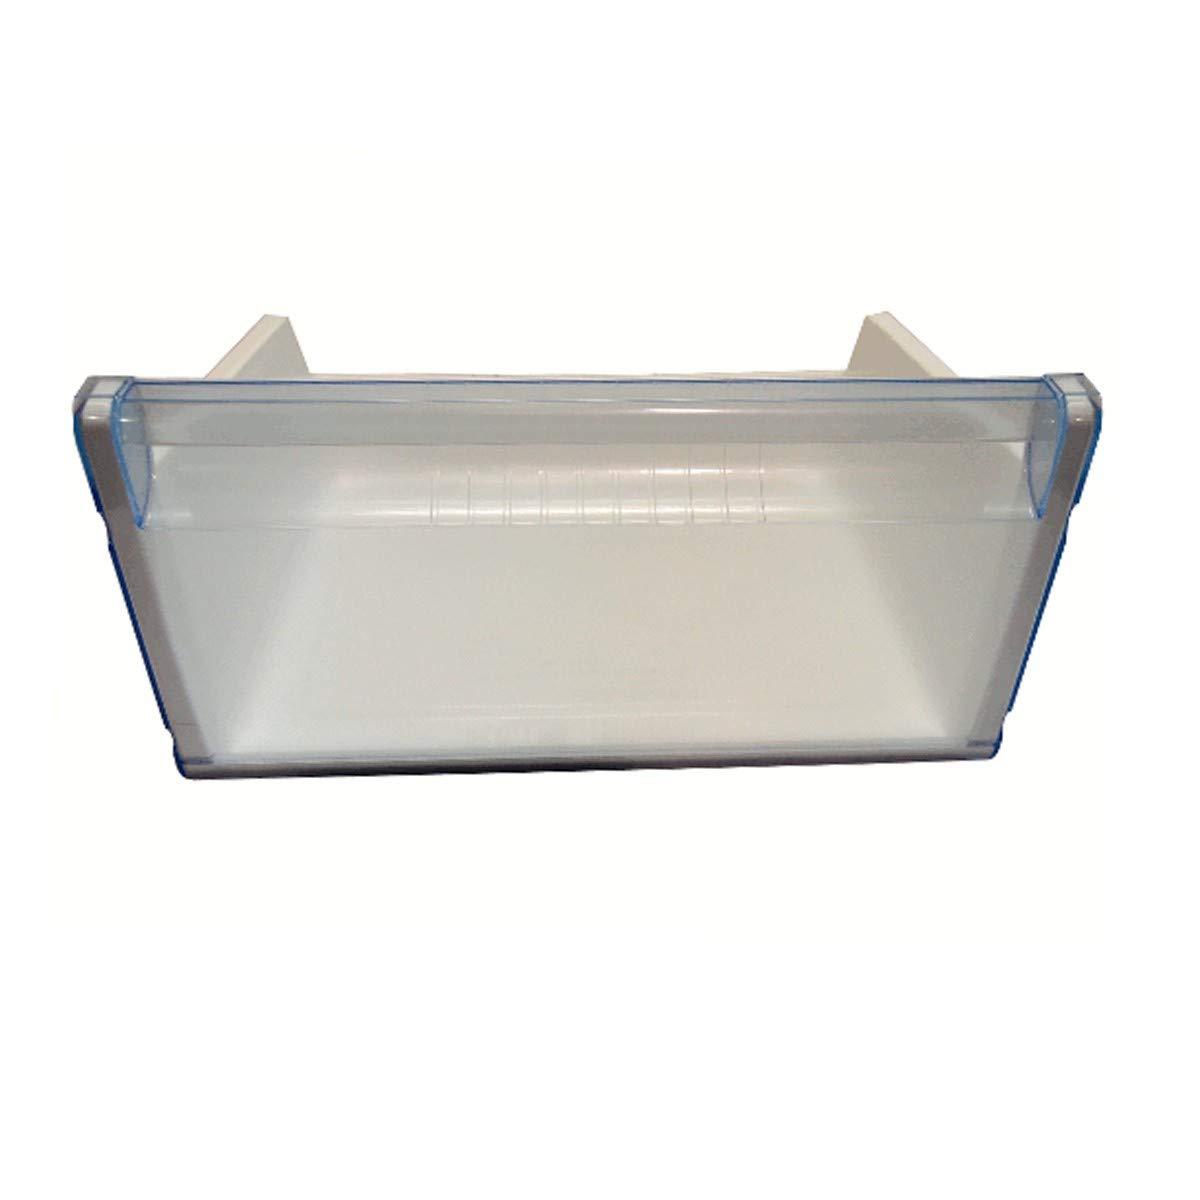 Recamania Cajón congelador frigorífico Bosch Compatible con ...